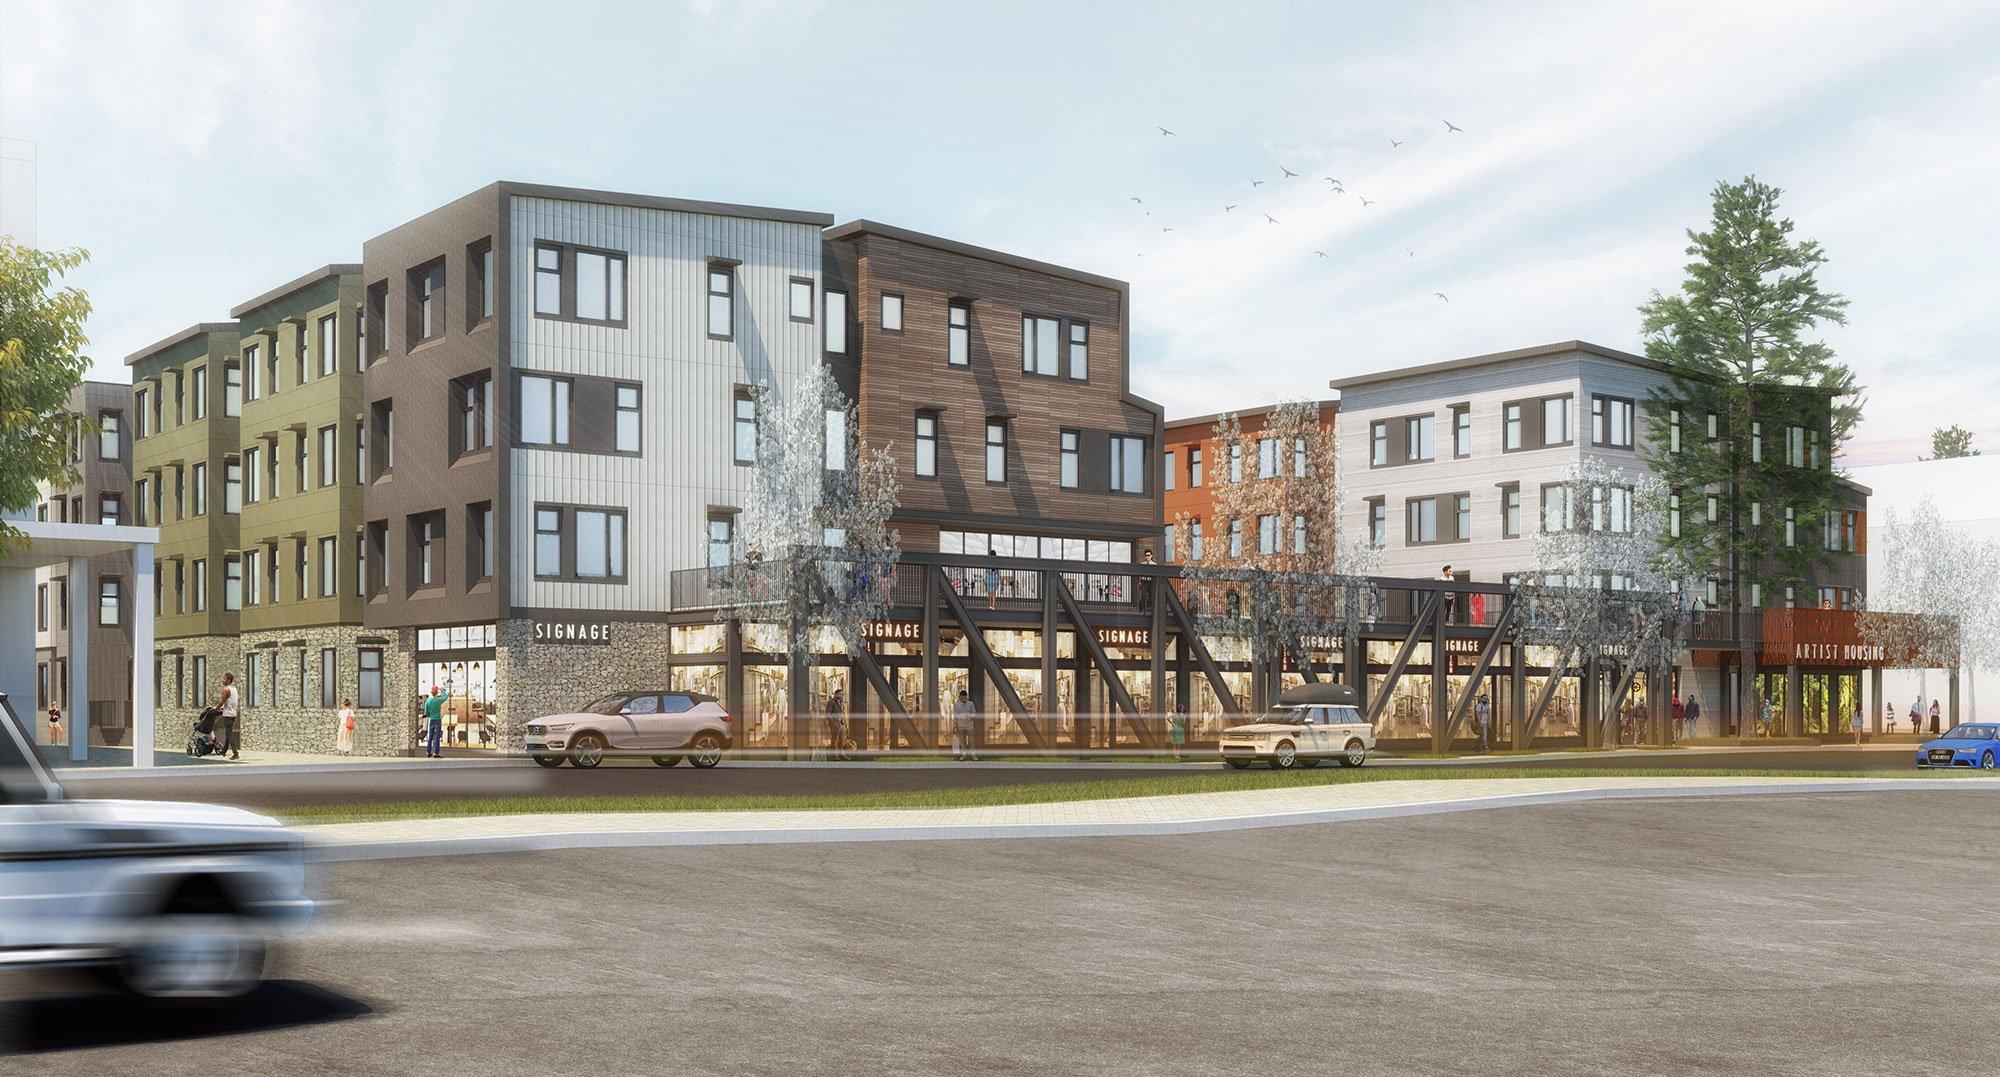 Artist Lofts-Truckee, CA-Lowney Architecture-1